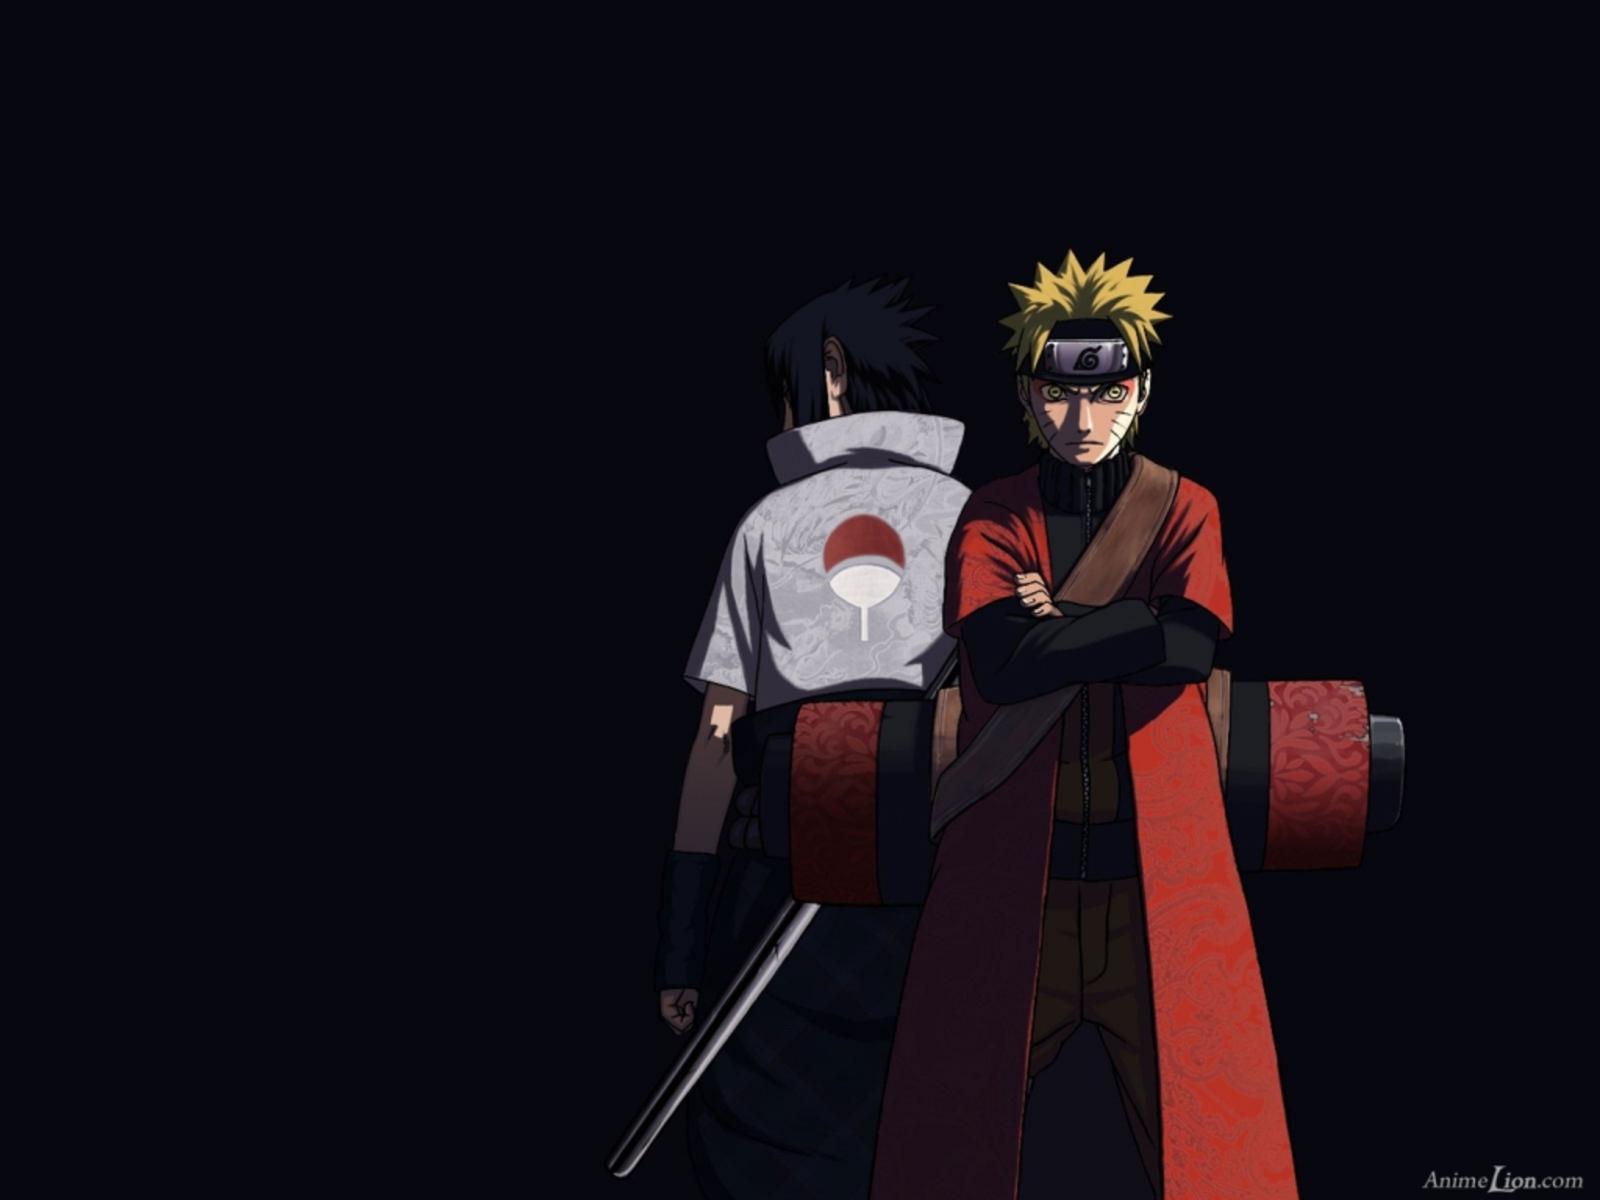 Naruto Shippuden New Wallpaper